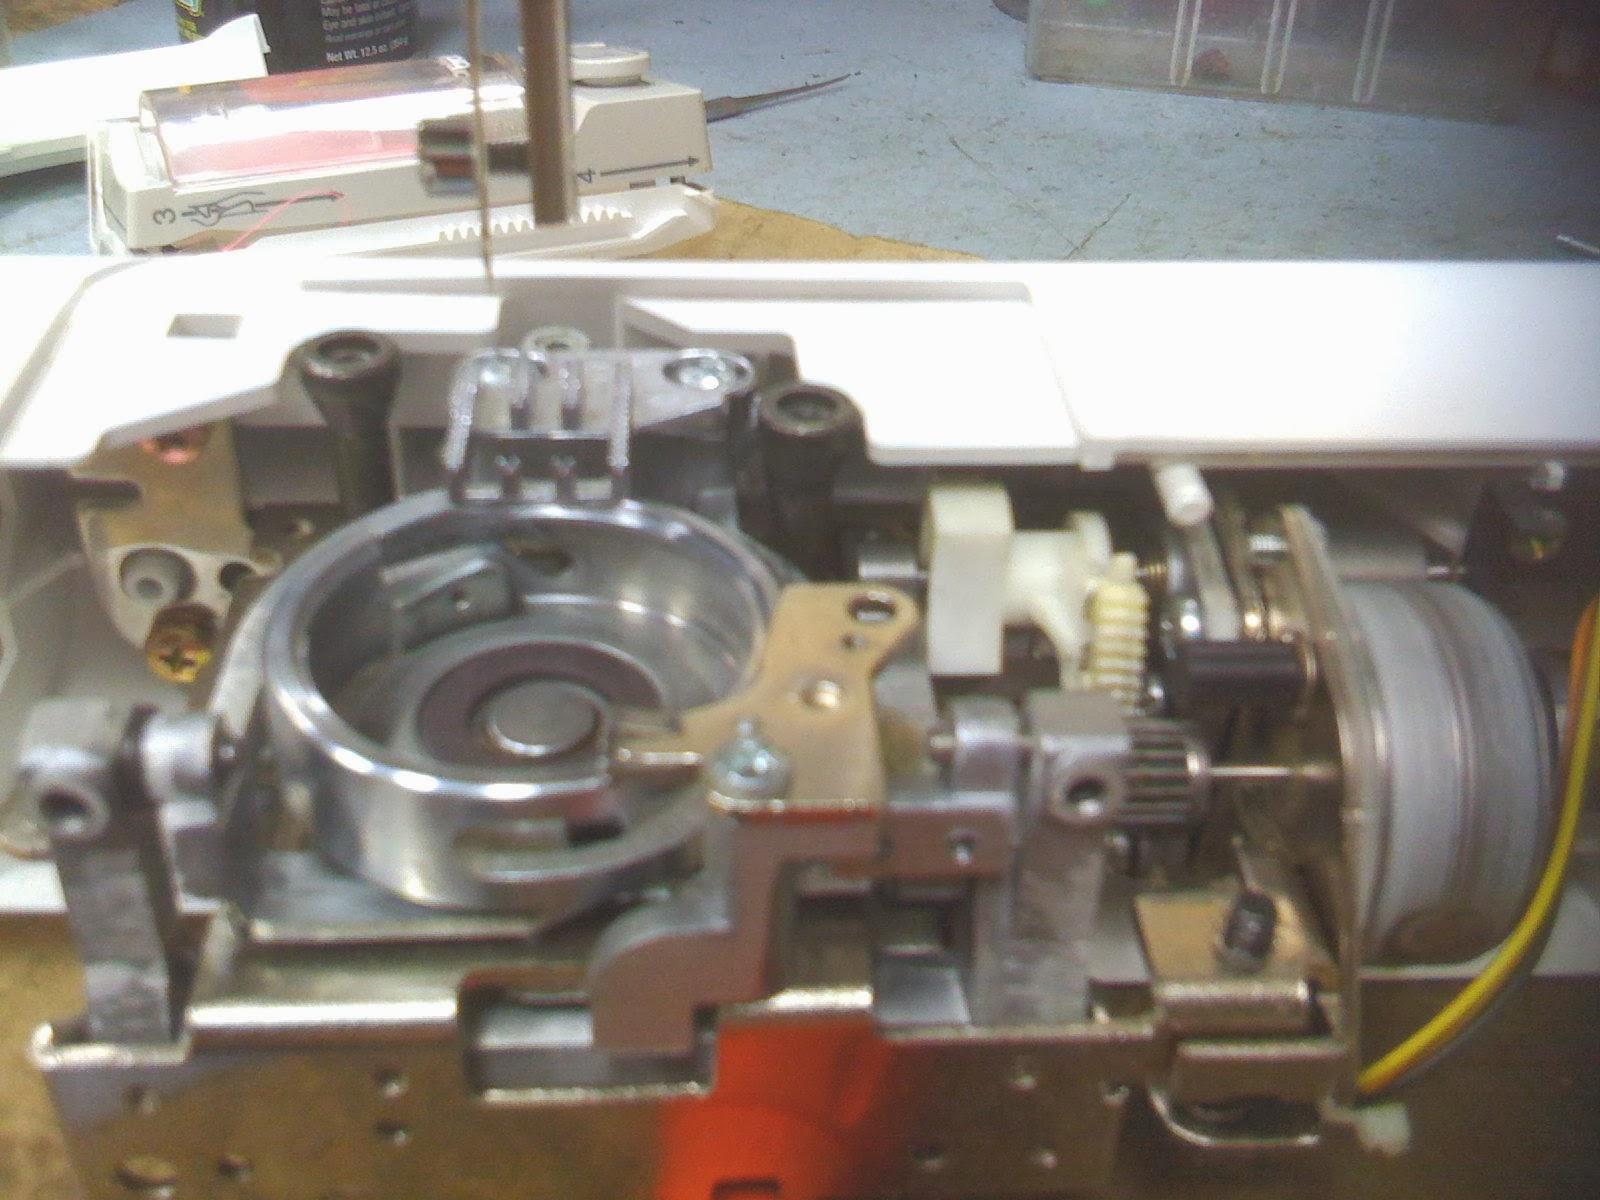 Sewing Machine Repair: Servicing a Brother CS80